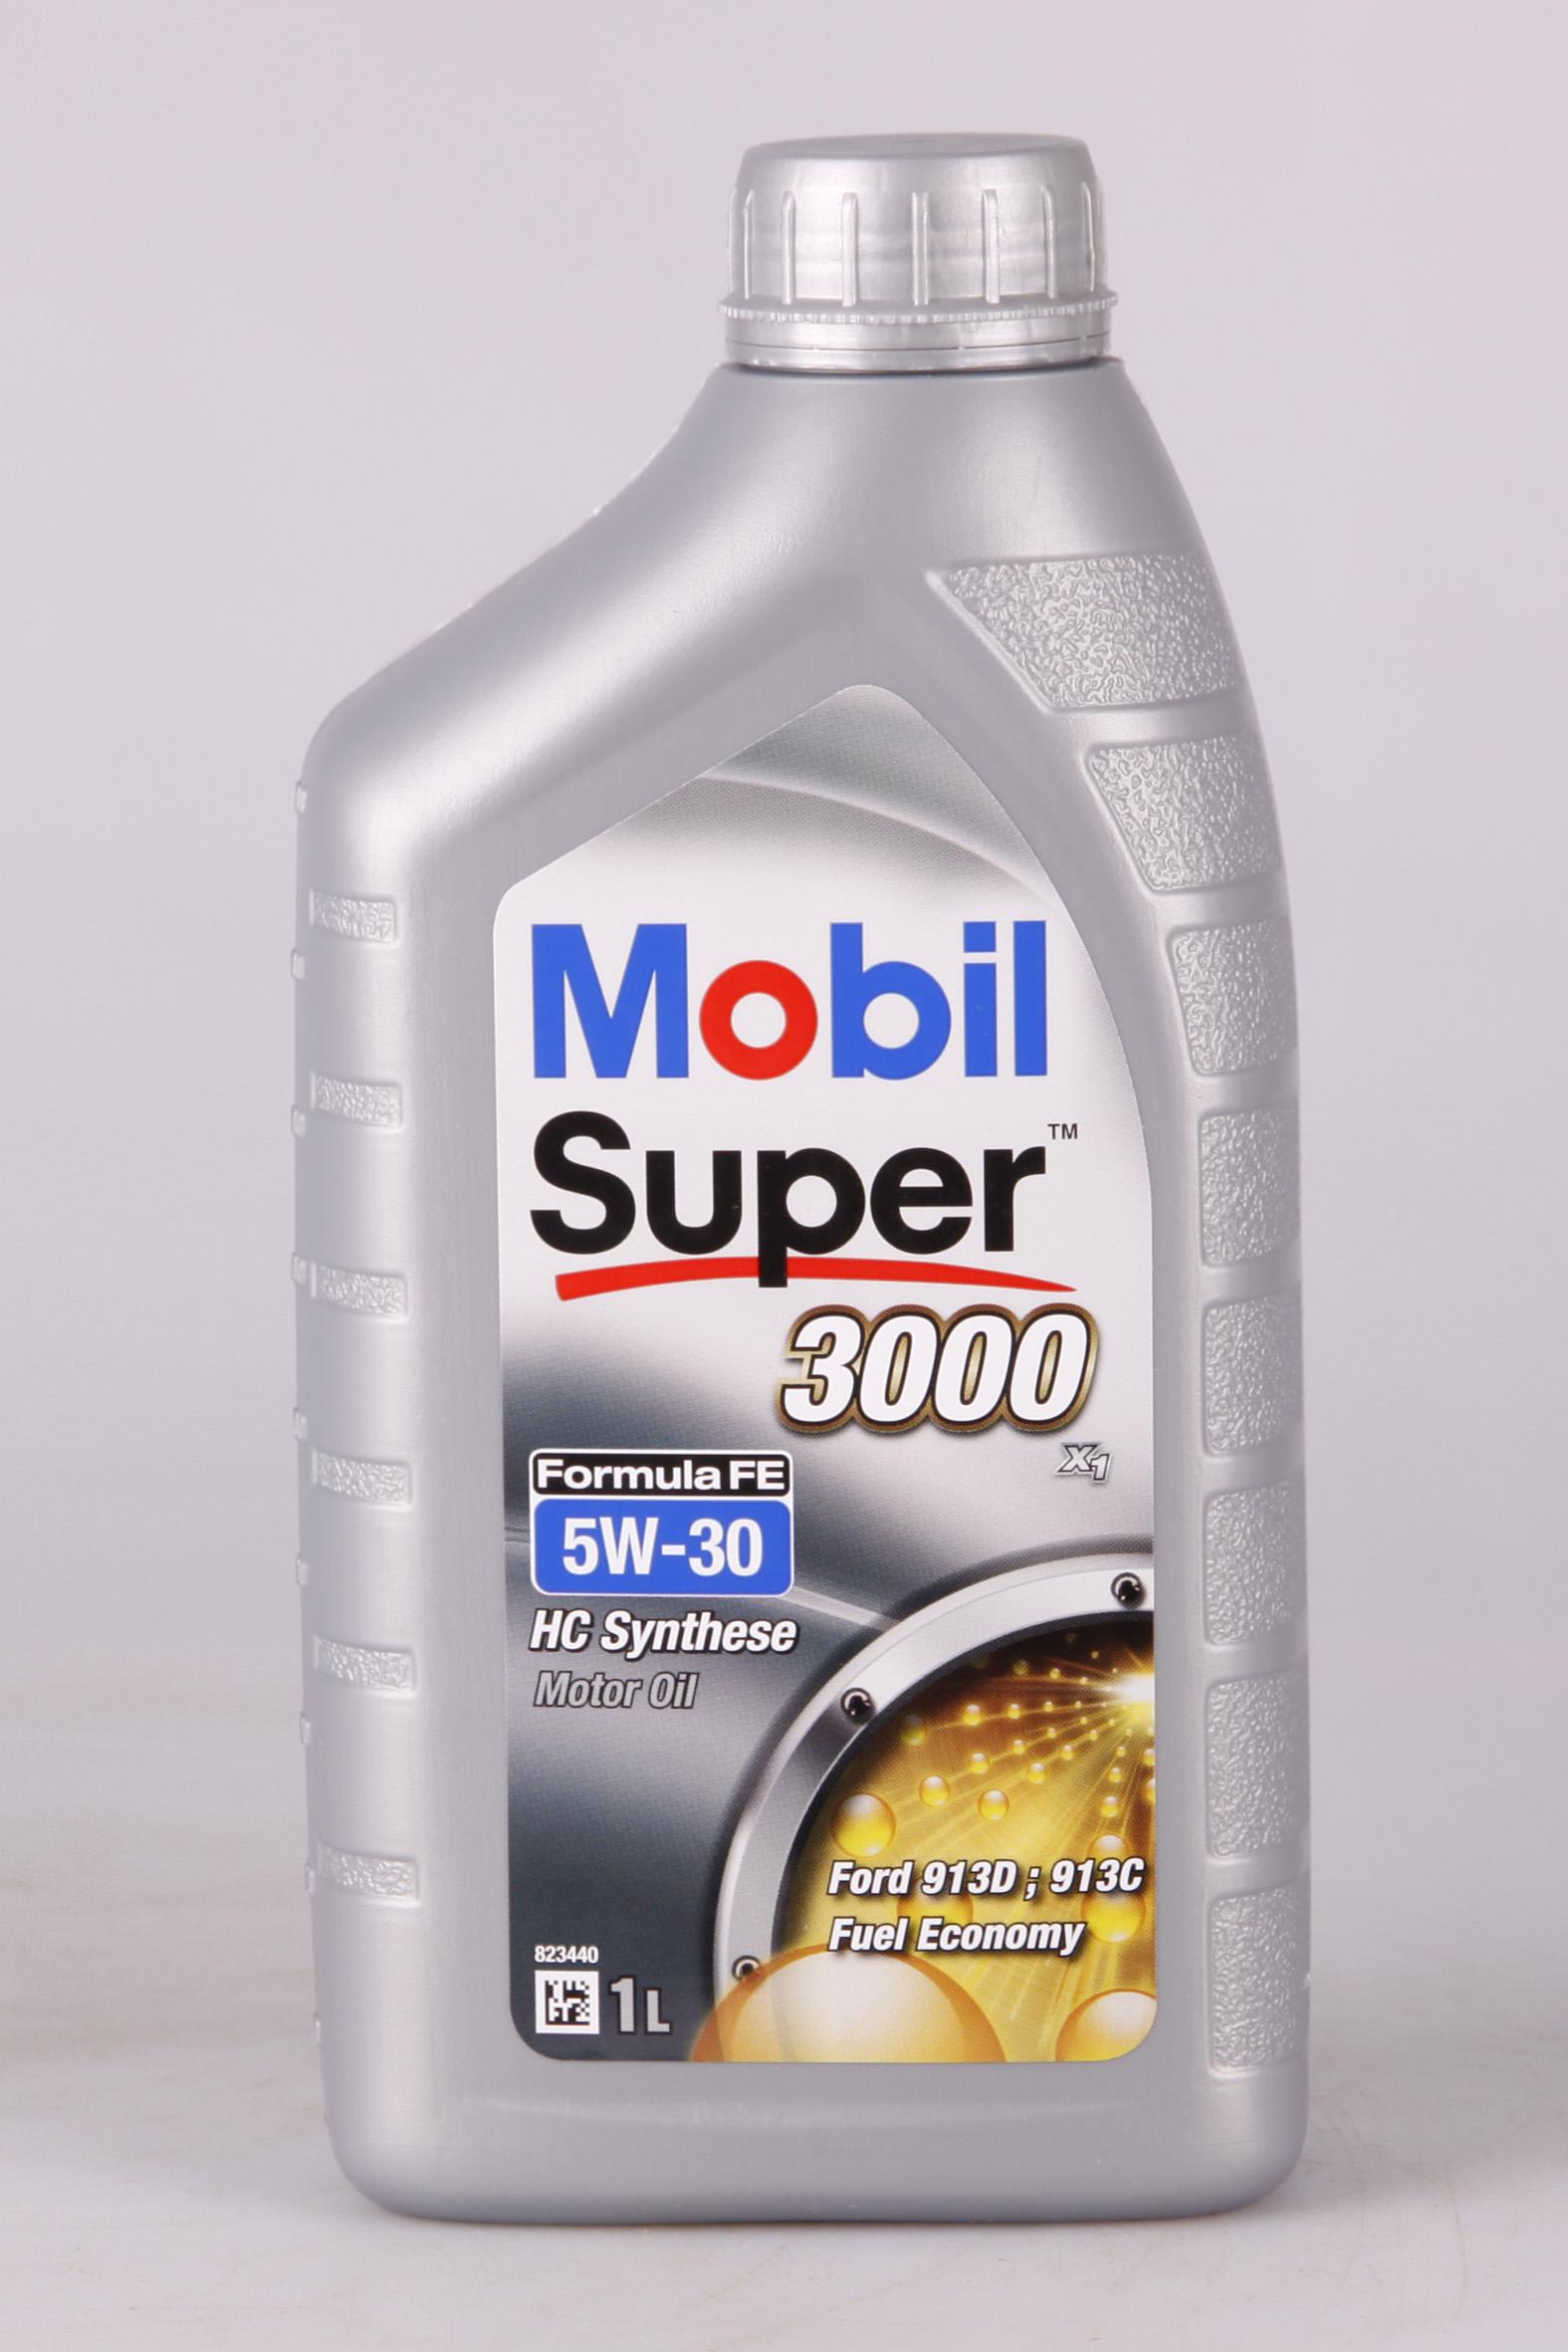 Mobil Super 3000 X1 Formula FE 5W-30 1 Liter